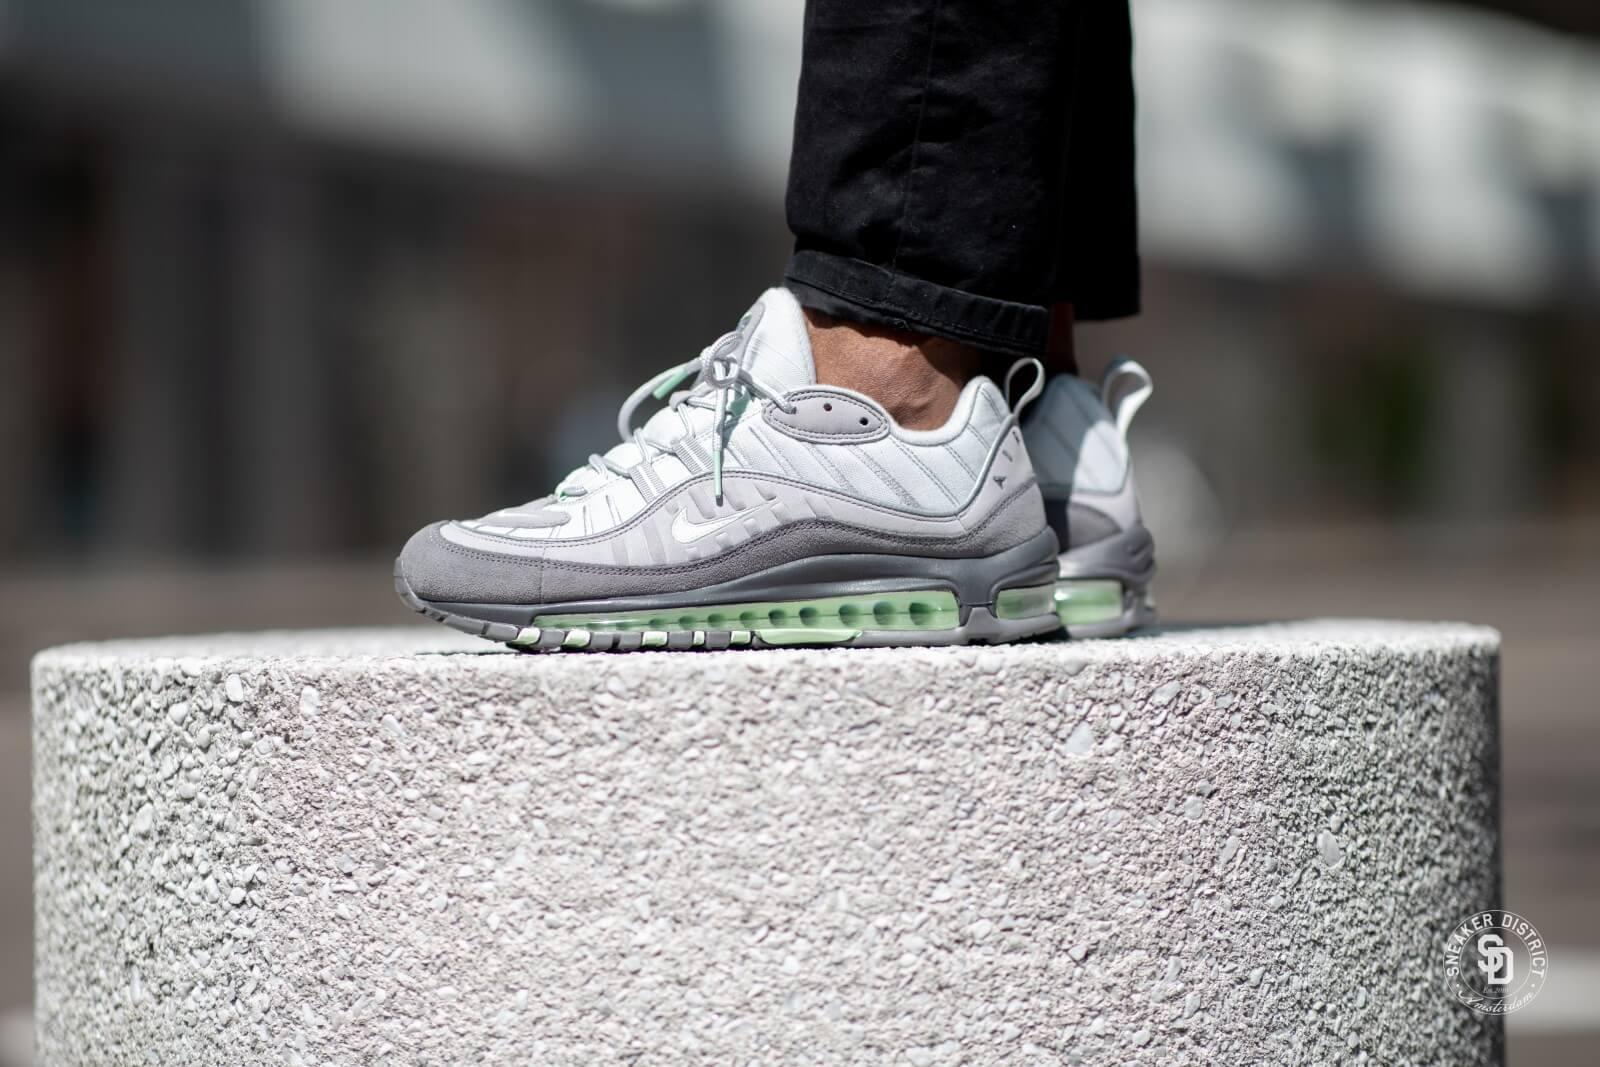 Nike Air Max 98 Vast Grey Fresh Mint 640744 011 Release Date